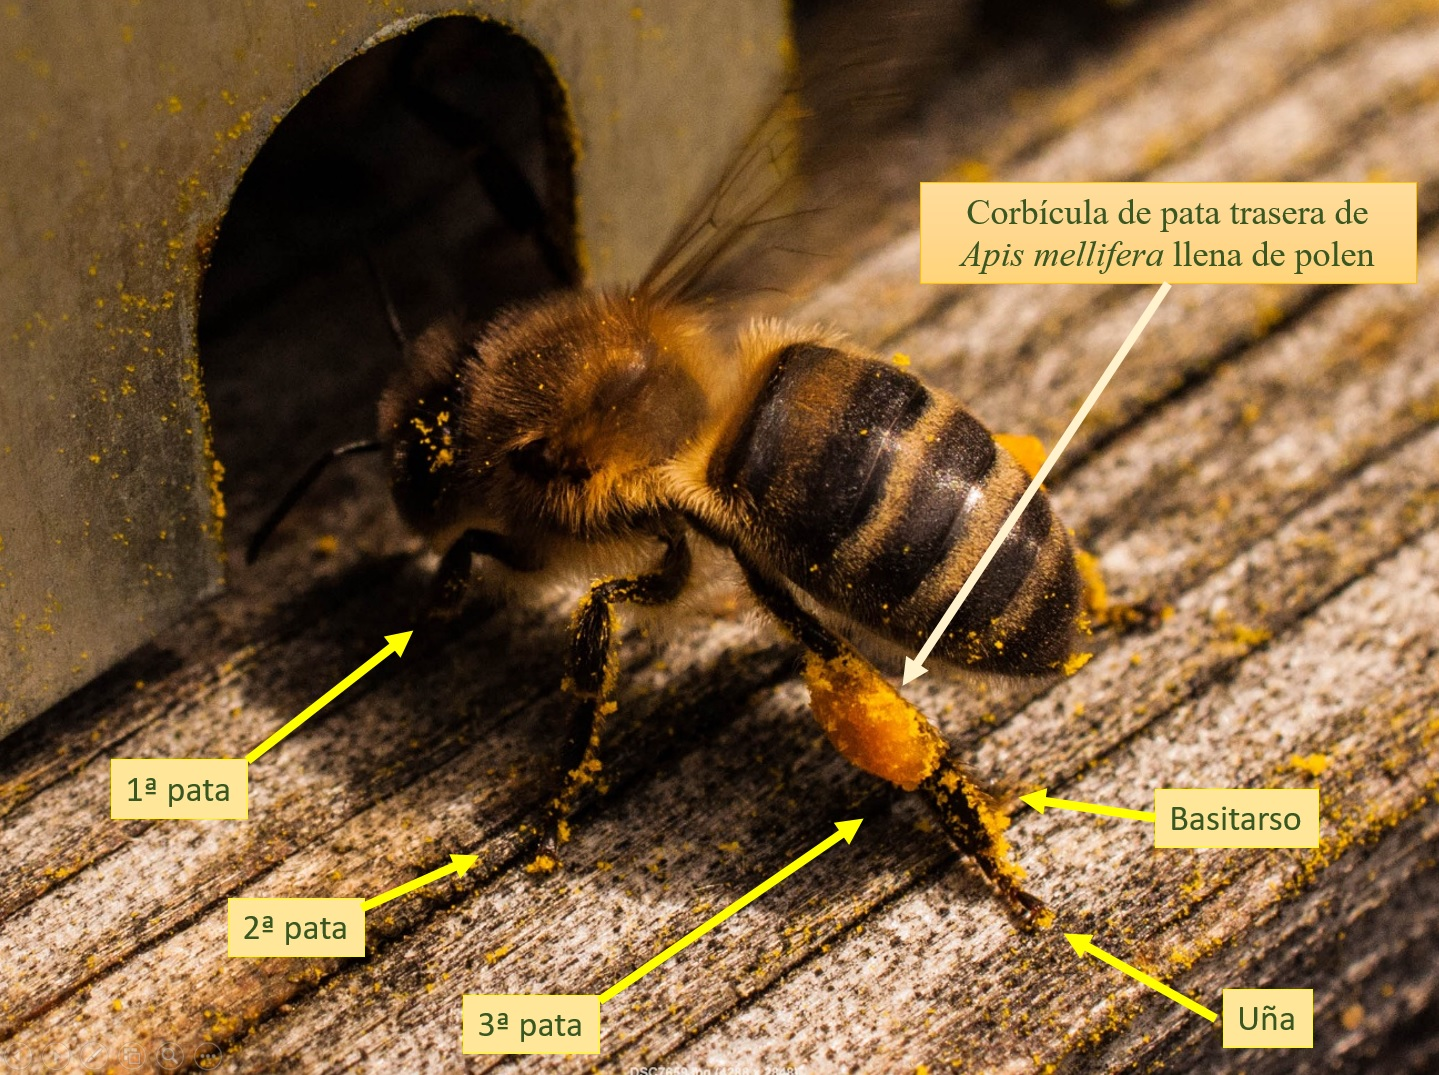 abeja con polen Pata trasera abeja Las Obreras de Aliste CB Artesanos de la Miel Aliste Gallegos del Campo Artesanos de la Miel